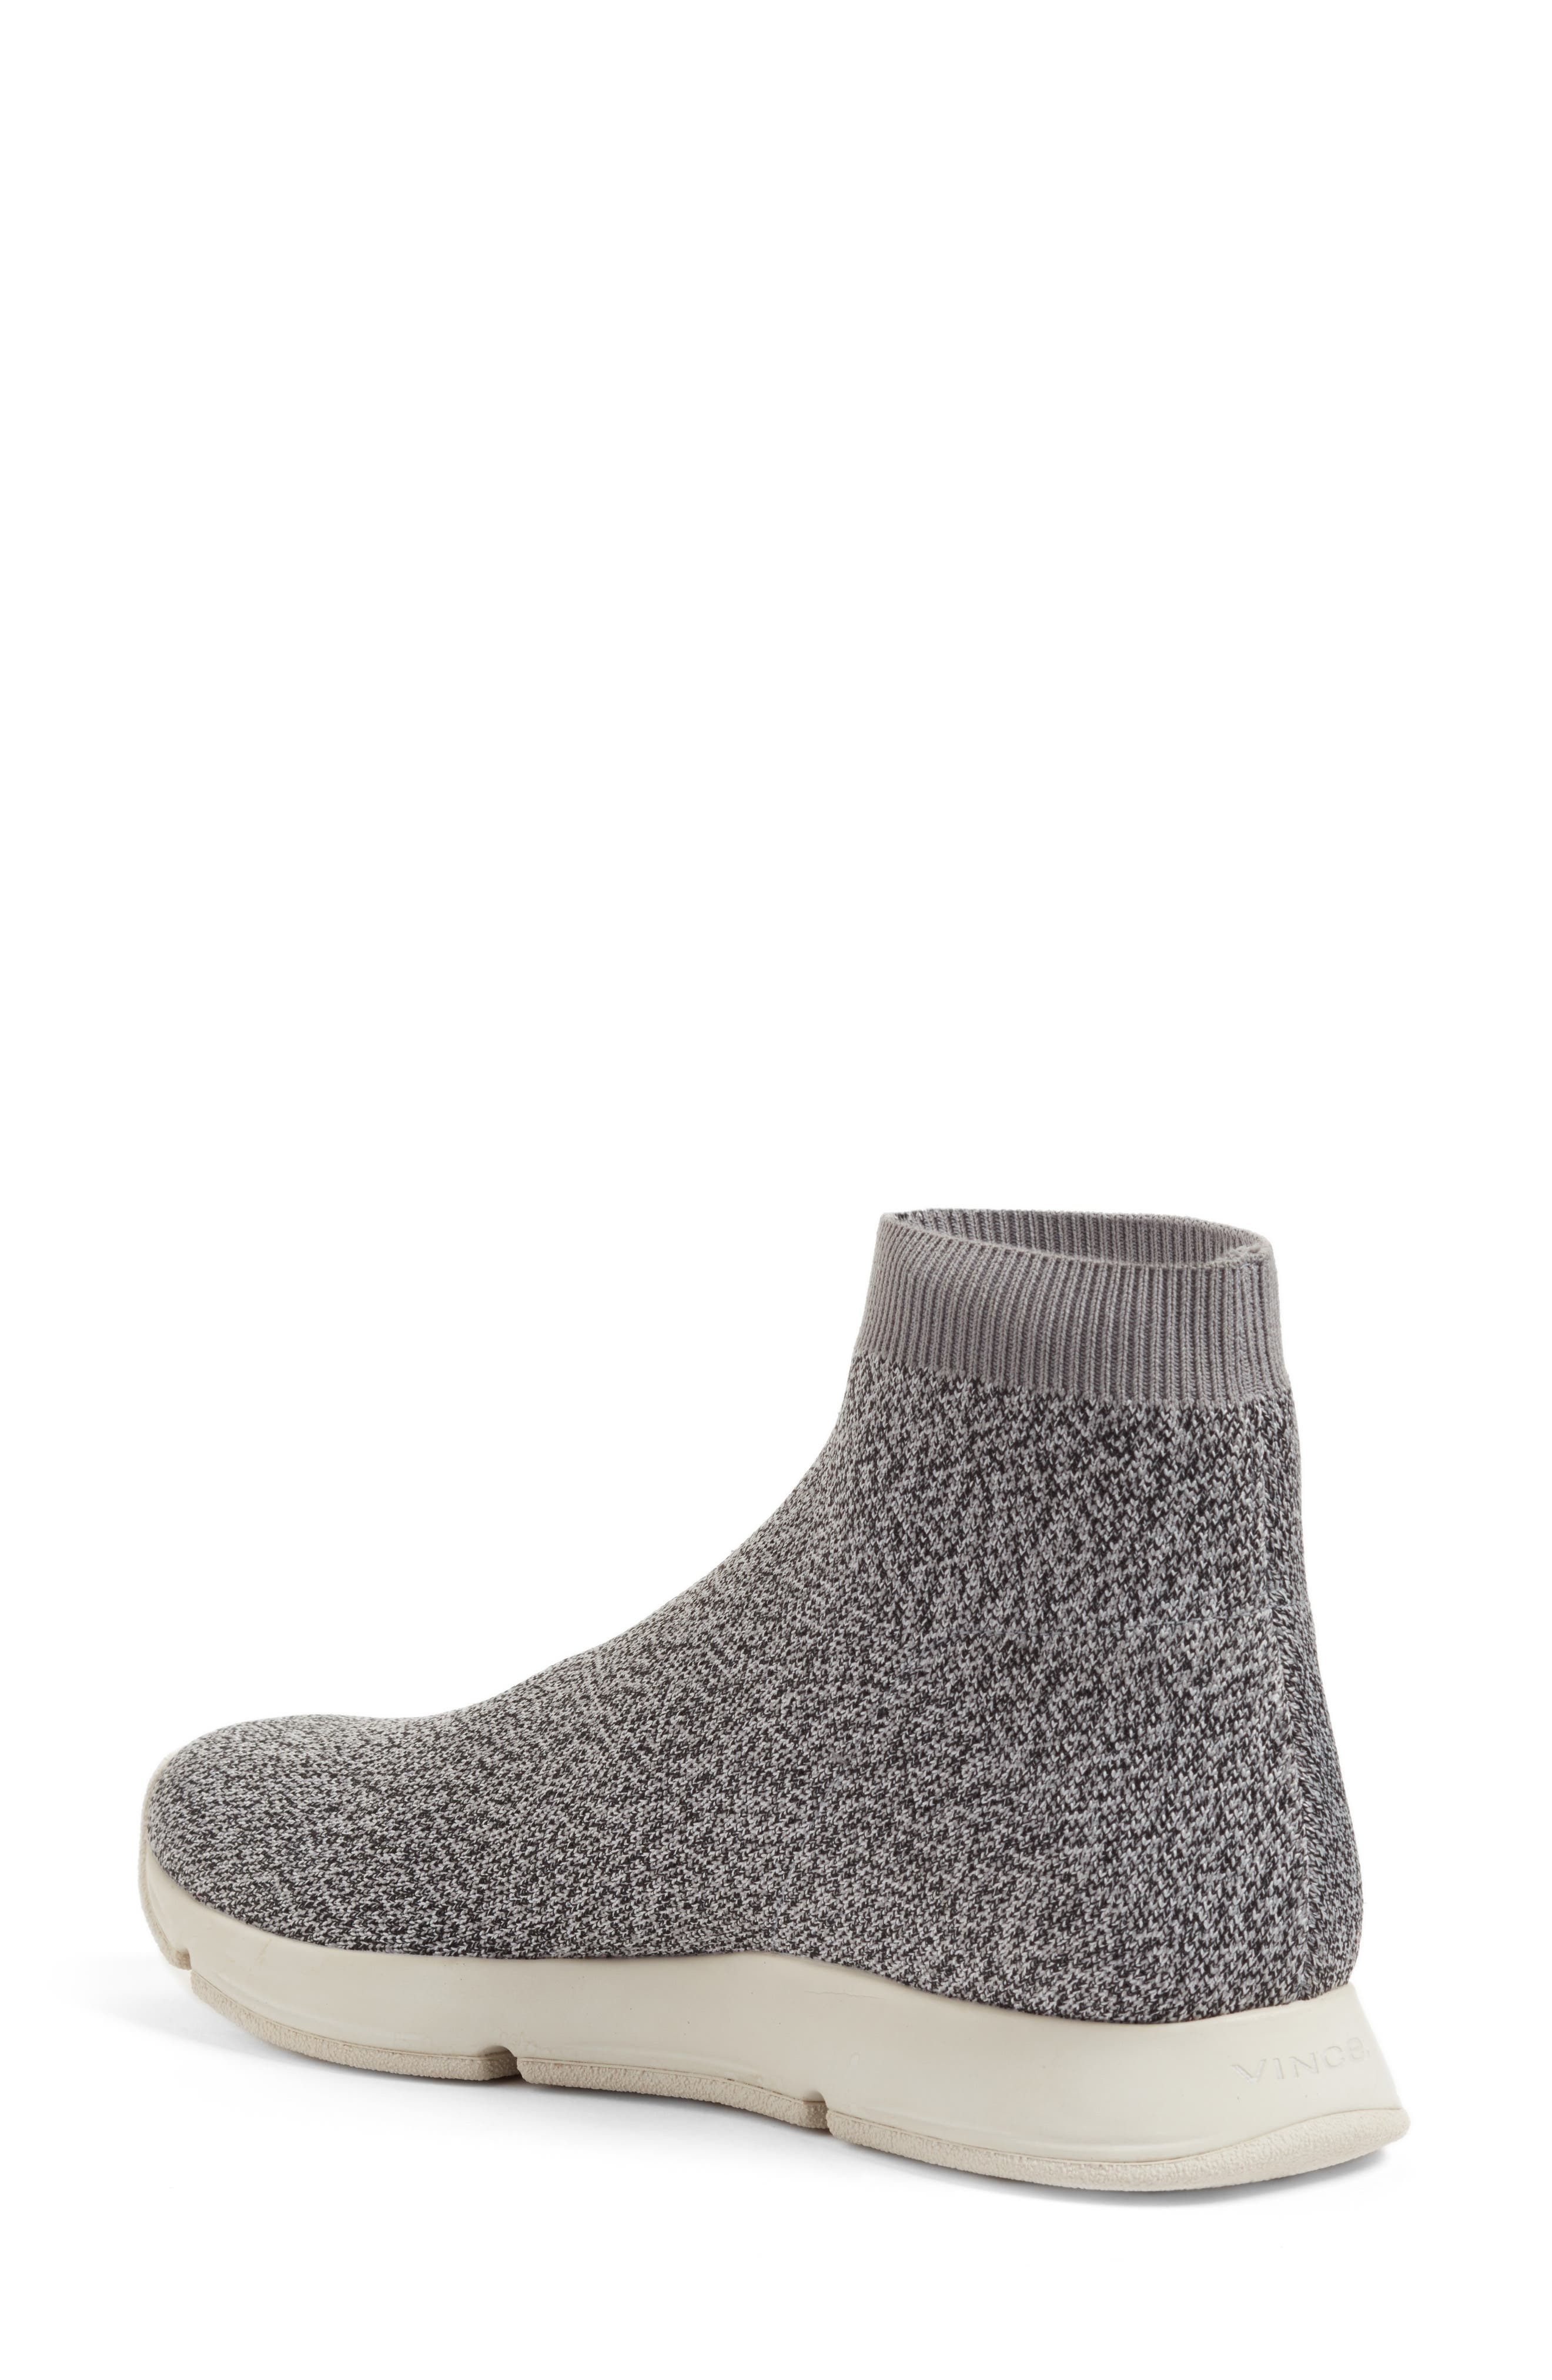 Tyra Sock Sneaker,                             Alternate thumbnail 2, color,                             Grey Marl